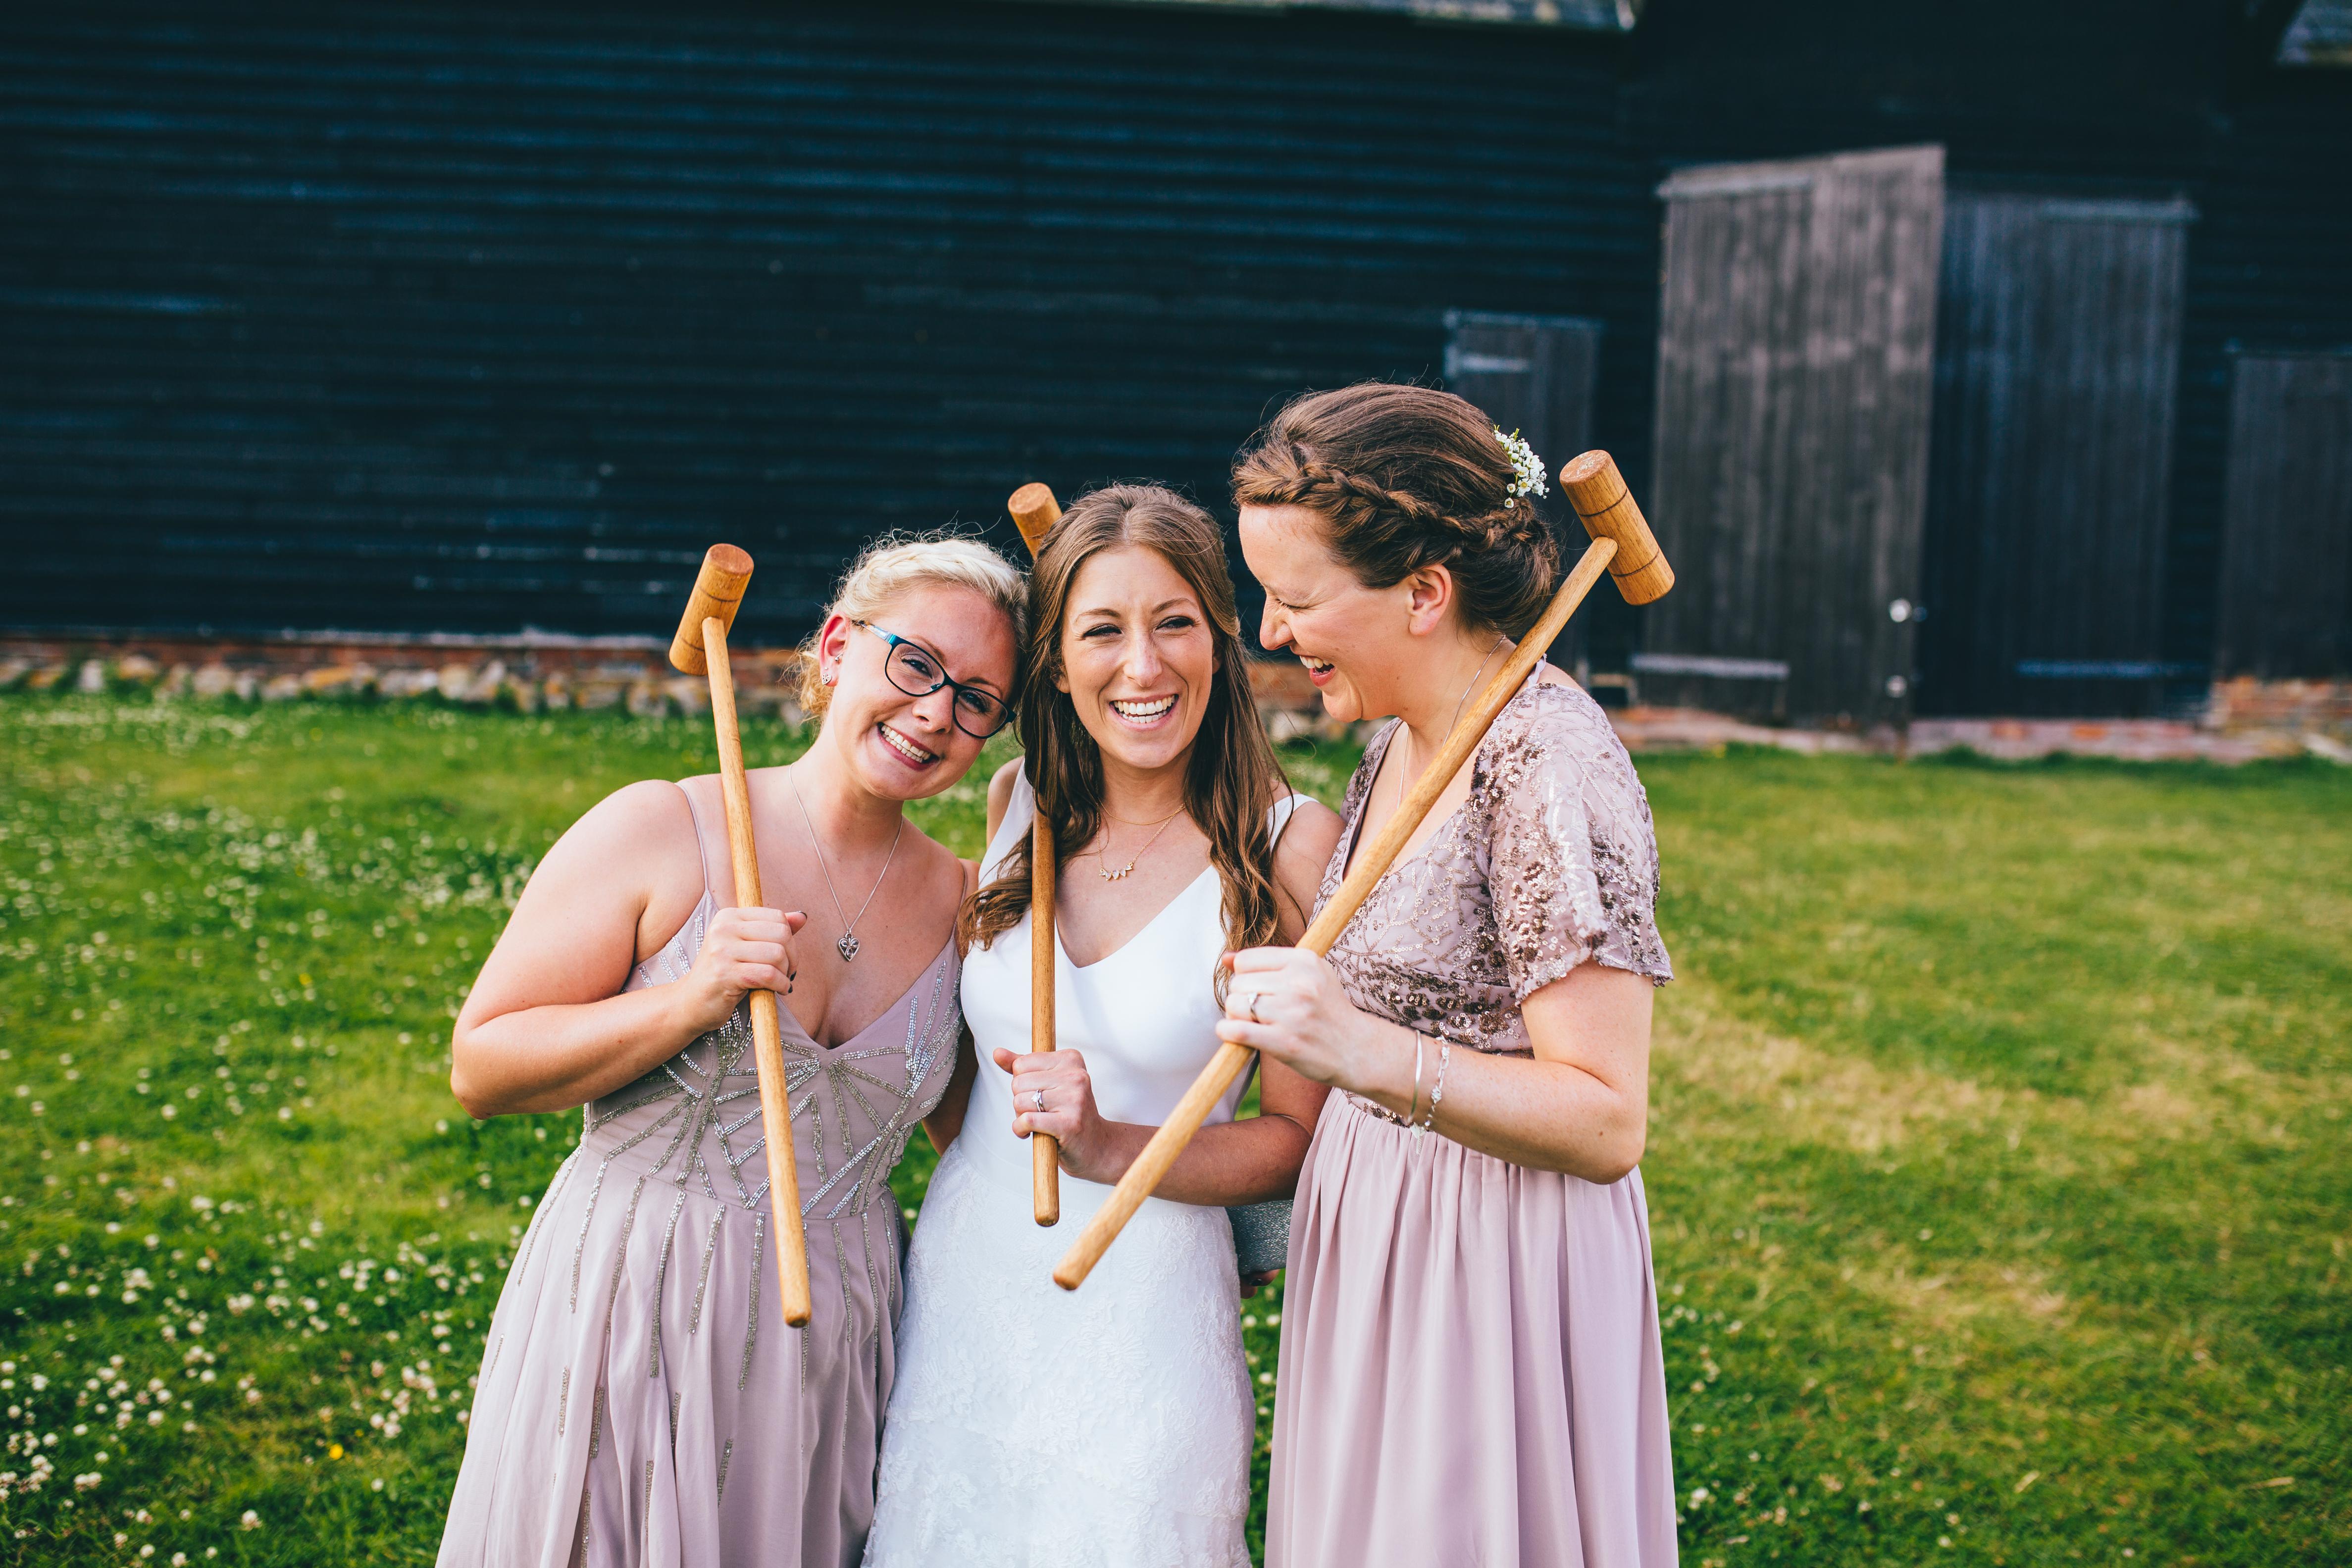 http://www.weddingphotographytolove.